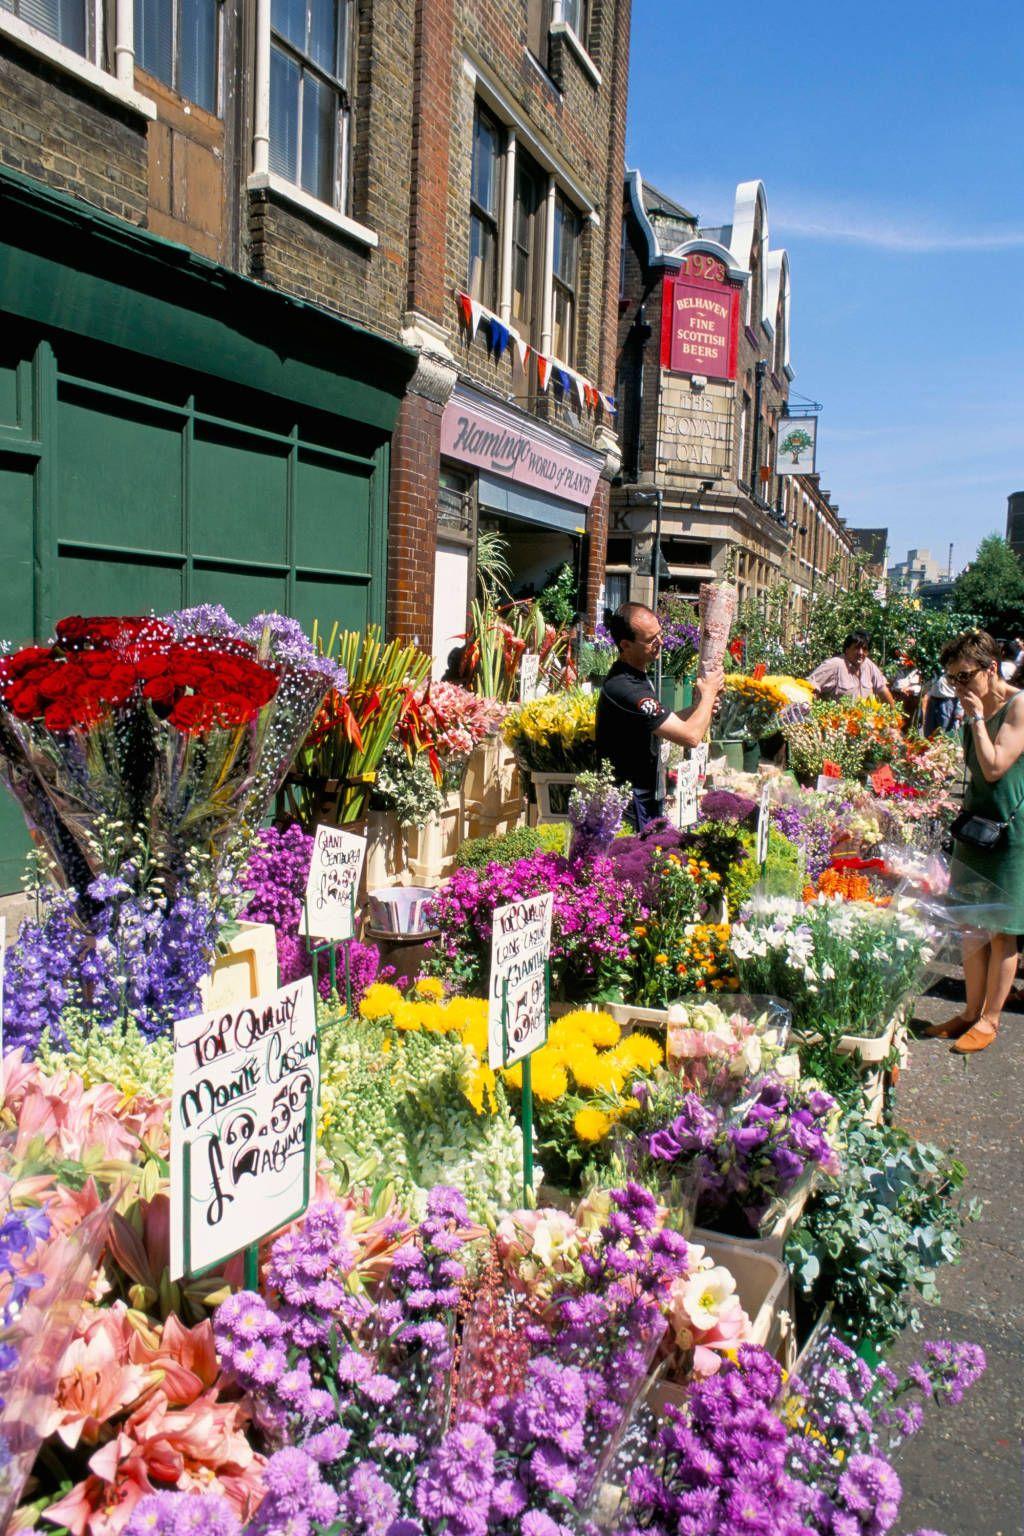 Thelist London Calling Columbia Road Flower Market Travel Guide London Flower Market